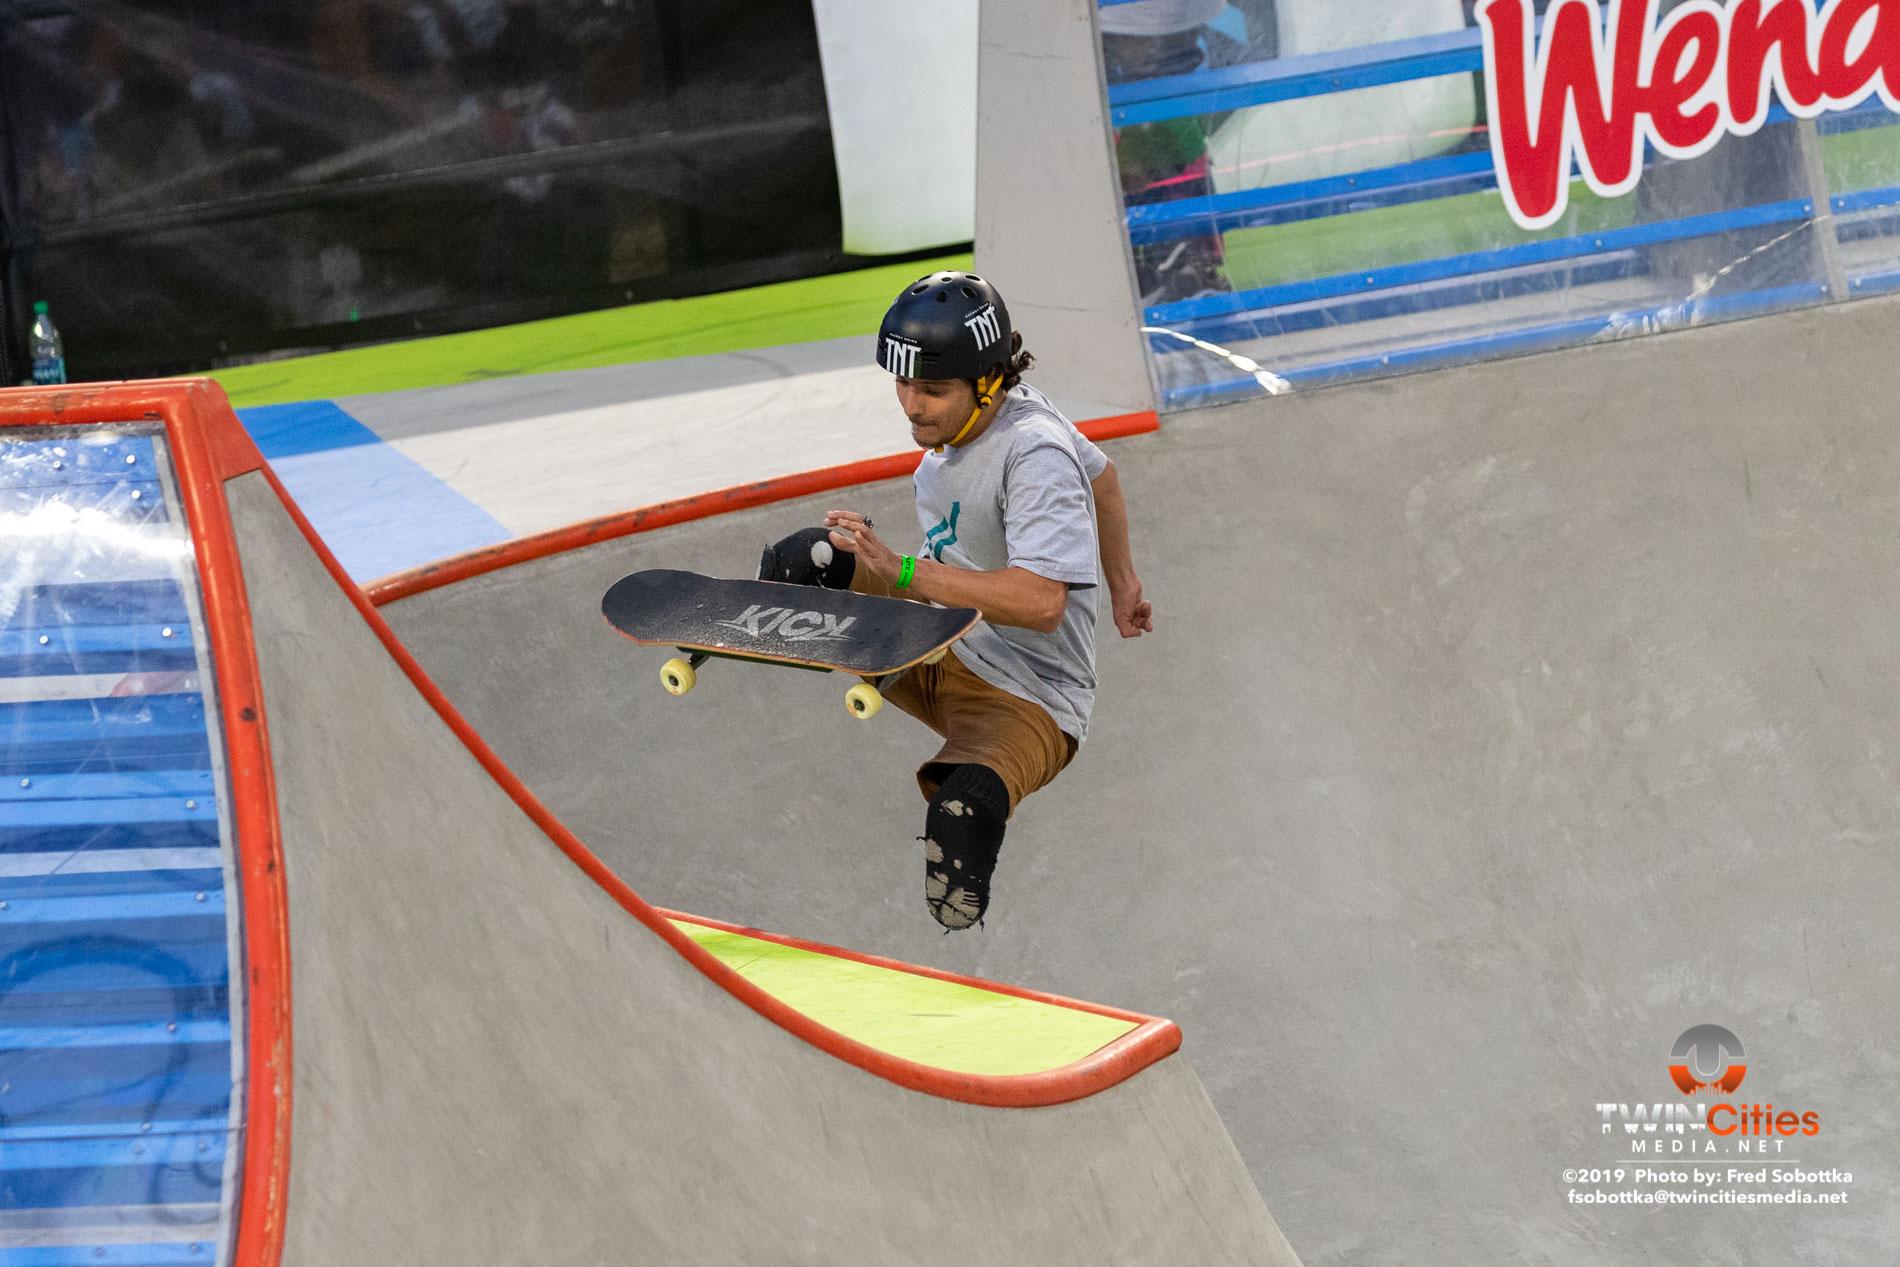 Adaptive-Skateboard-Park-03